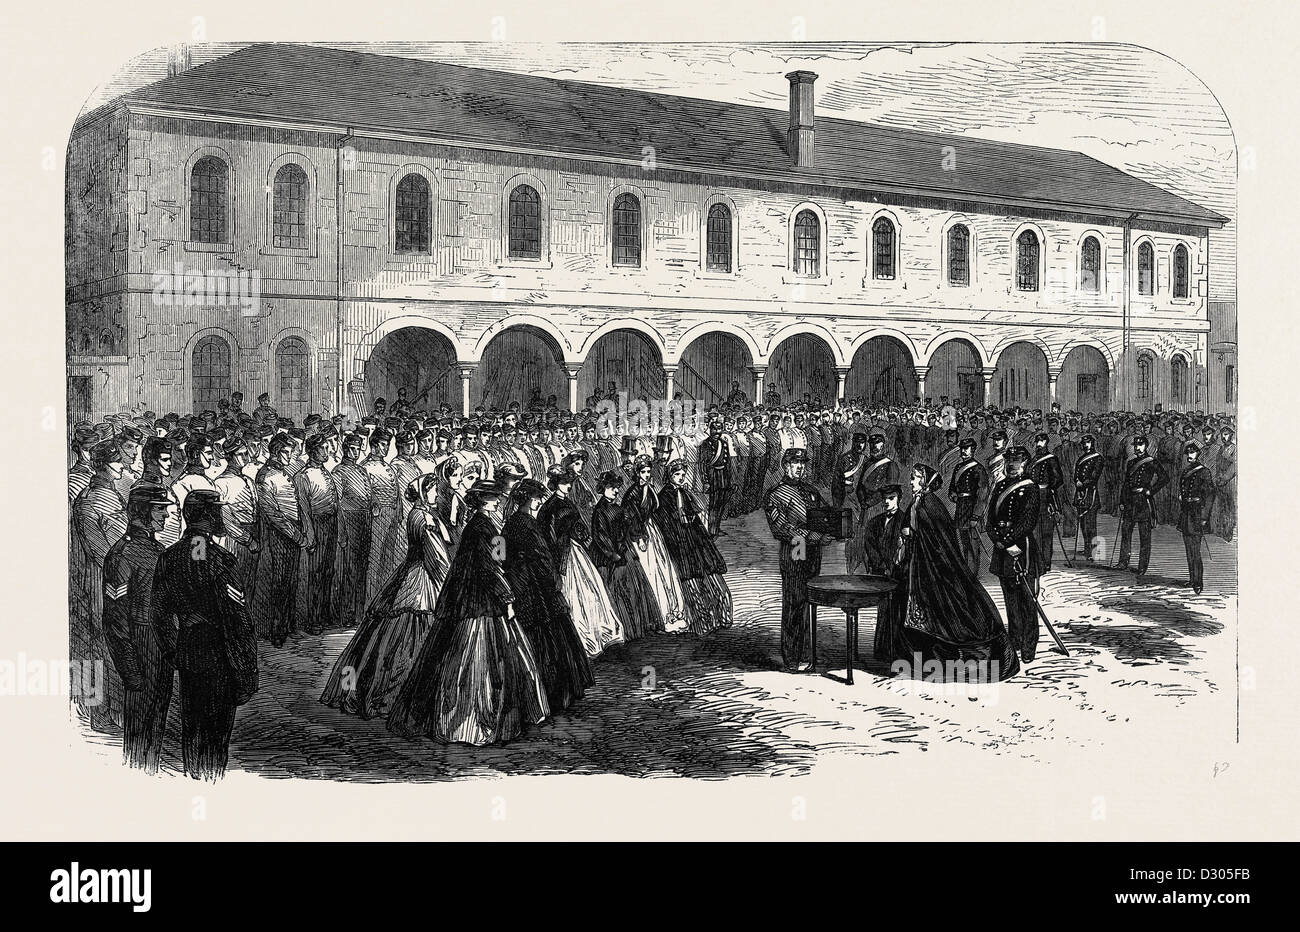 PRESENTATION TO MRS. COLONEL BINGHAM BY THE DORSET MILITIA UK 1866 - Stock Image